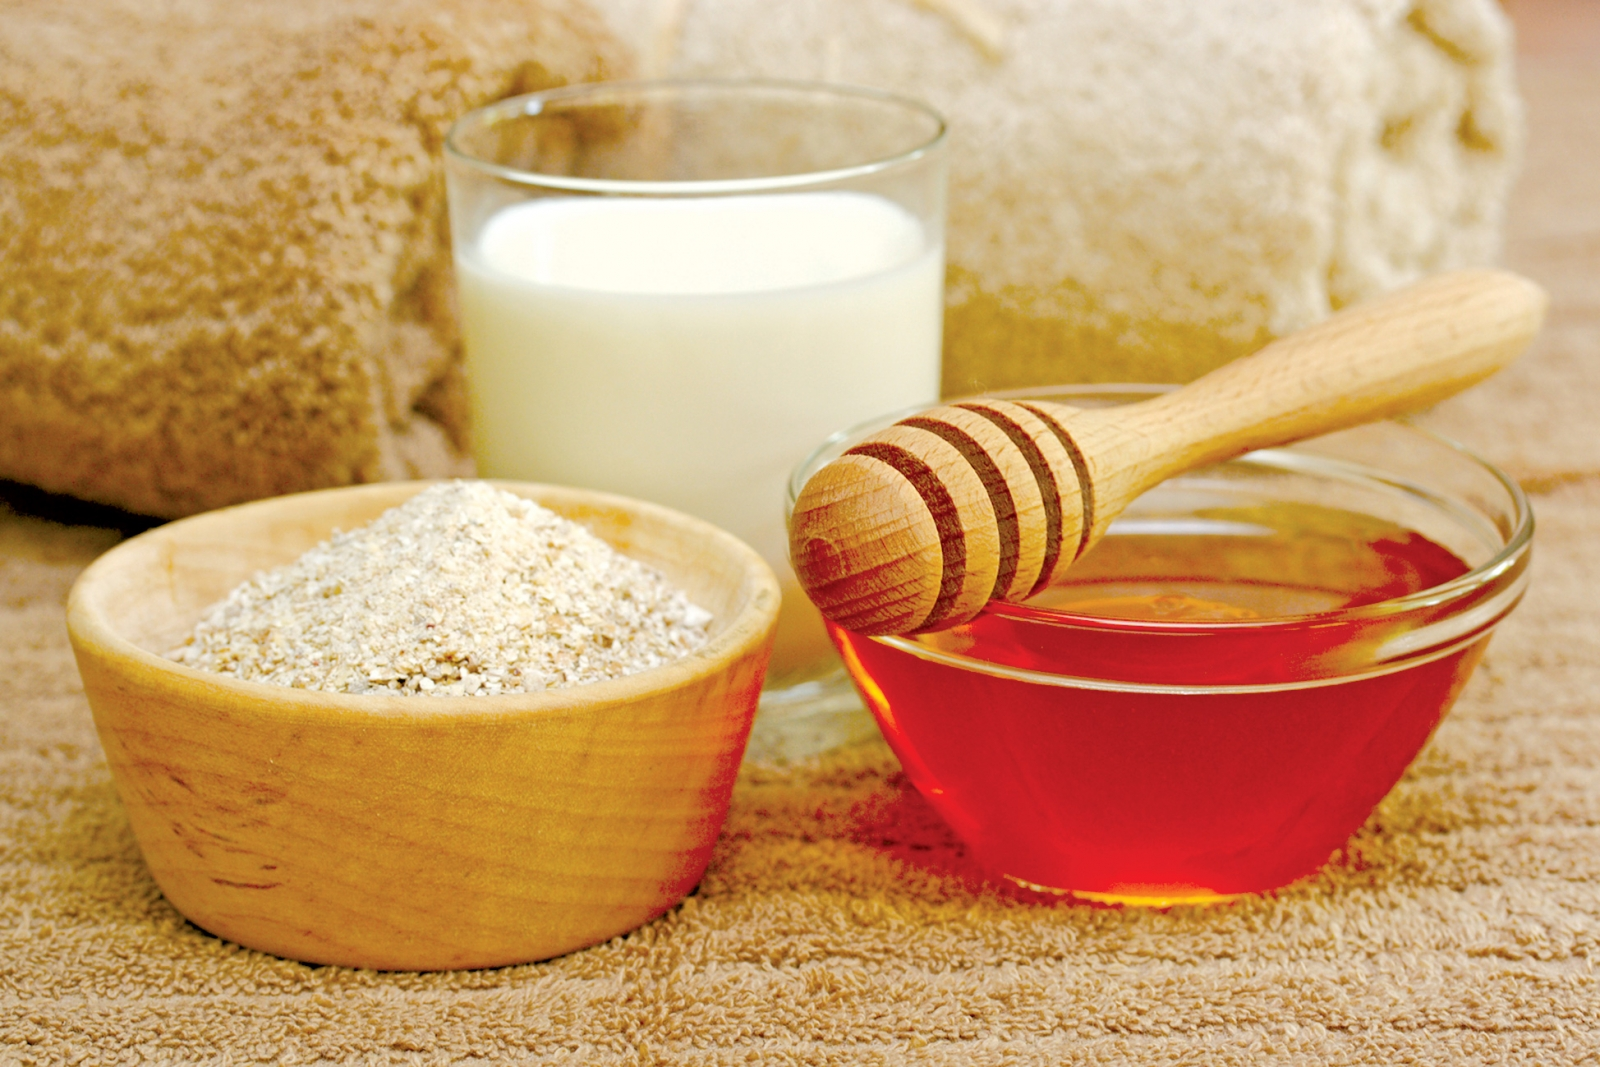 Image result for Baking soda mật ong sữa tươi